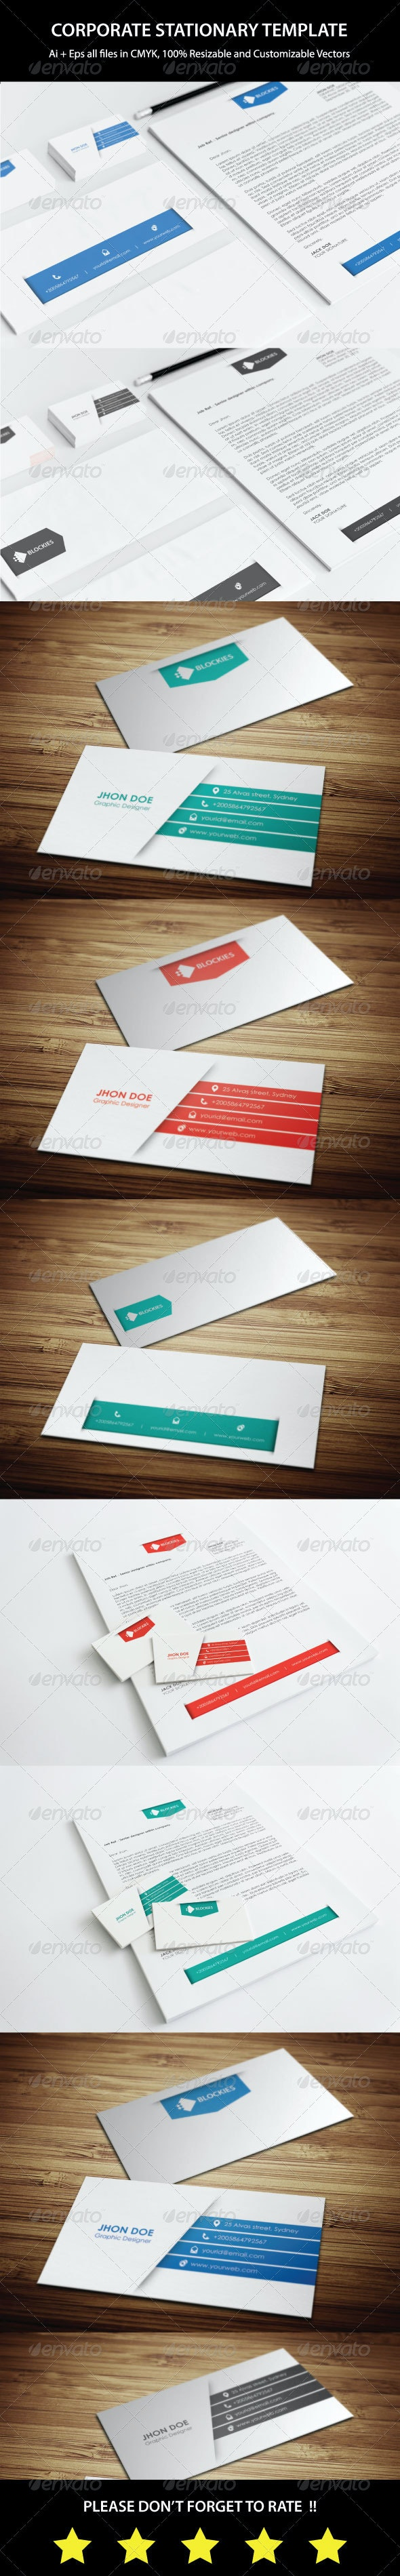 Corporate Stationery Template V.1 - Stationery Print Templates